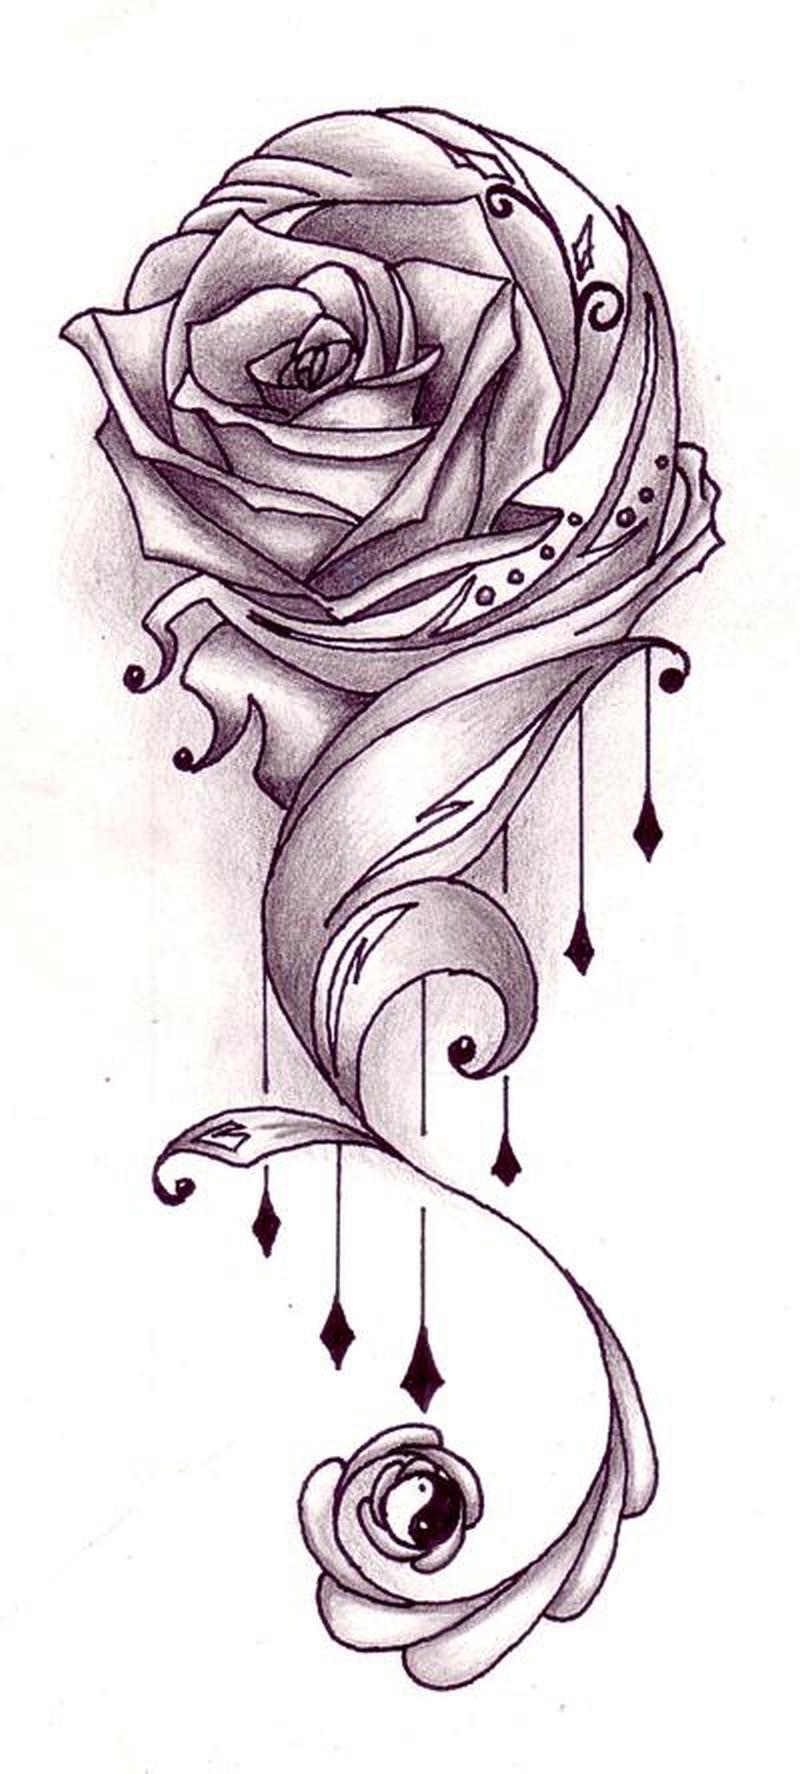 Tattoo design of flower